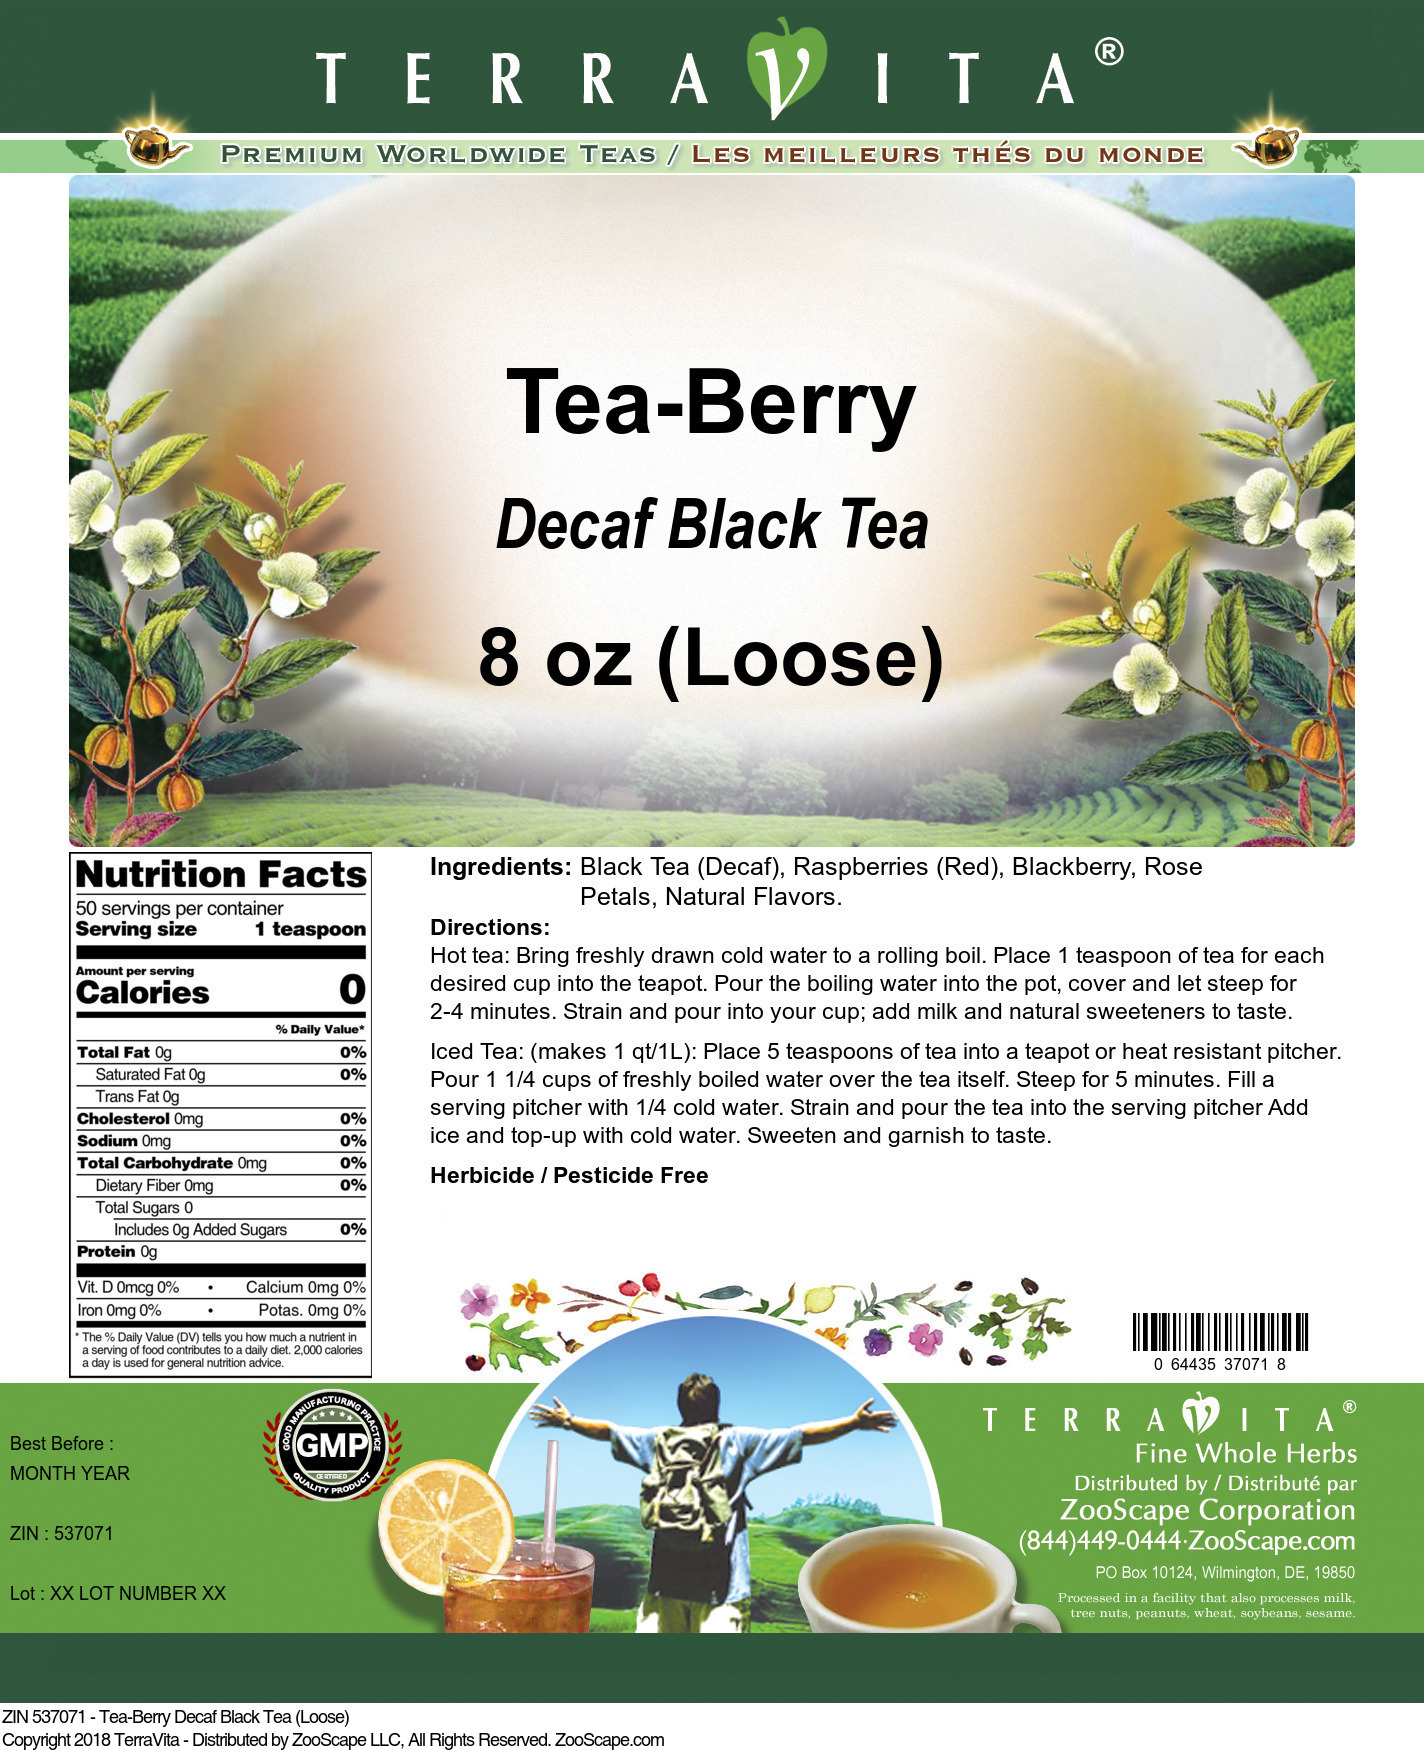 Tea-Berry Decaf Black Tea (Loose)